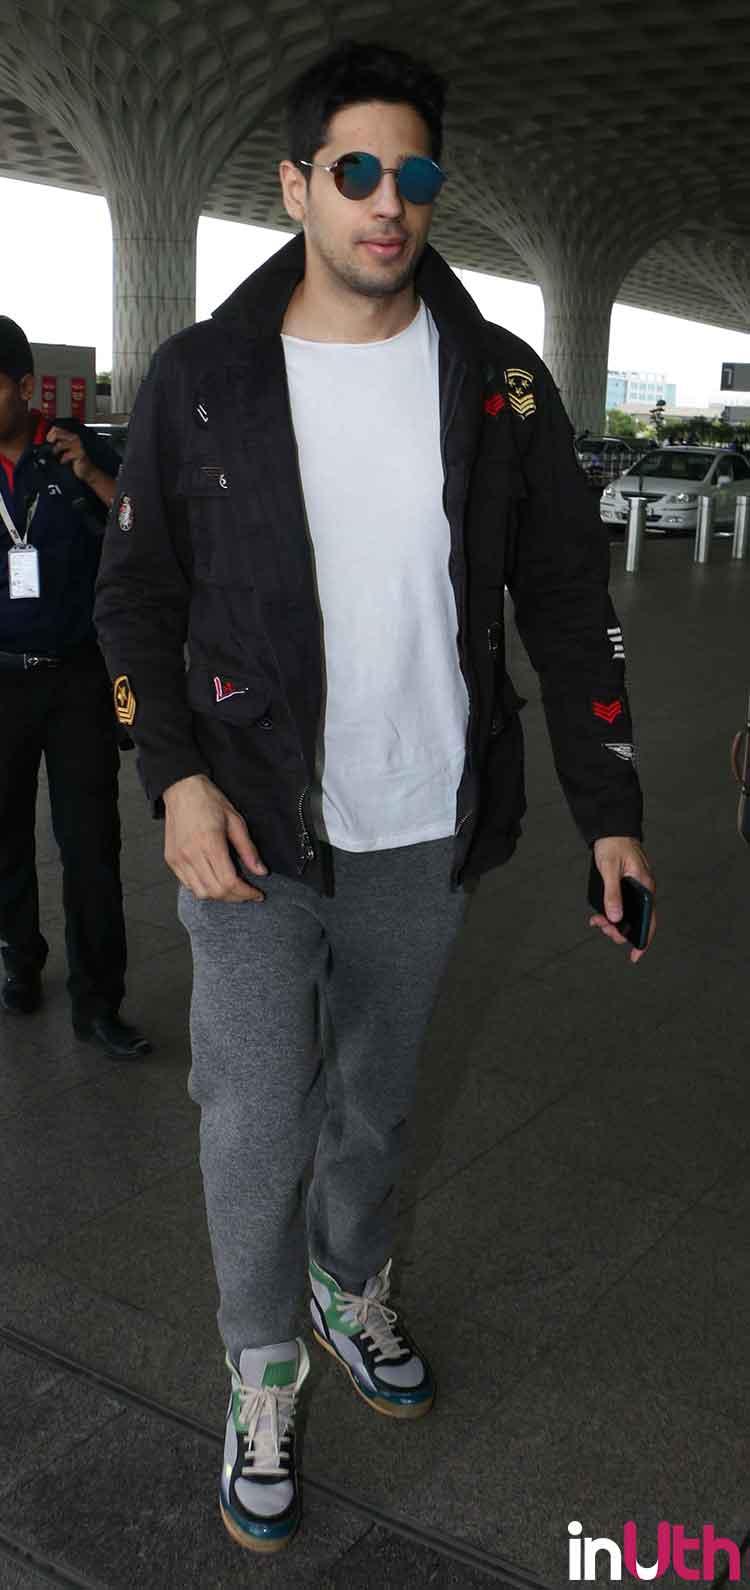 Sidharth Malhotra's dashing airport appearance